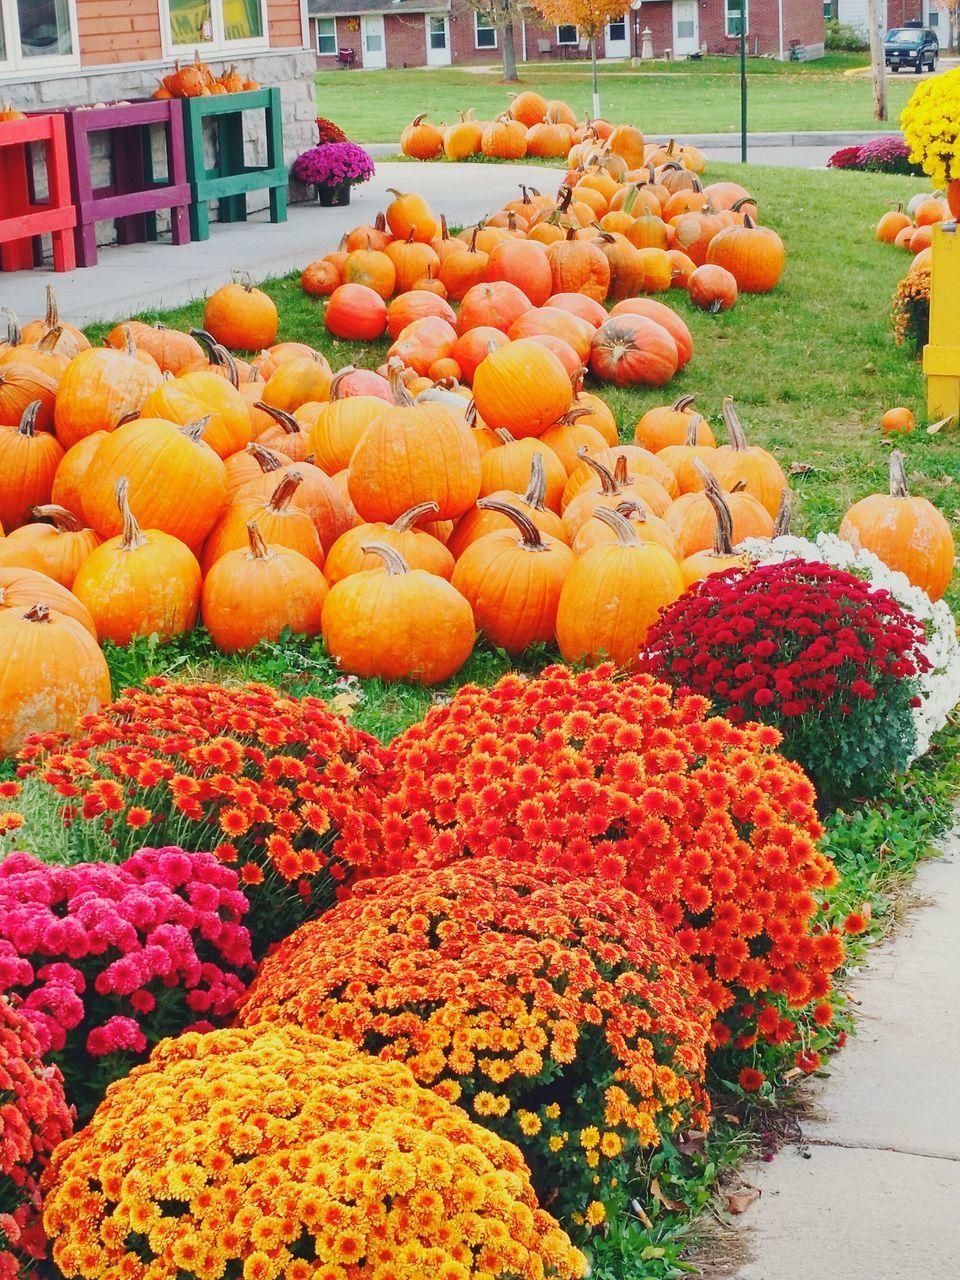 orange color, outdoors, freshness, for sale, day, abundance, market, retail, no people, pumpkin, flower, nature, food